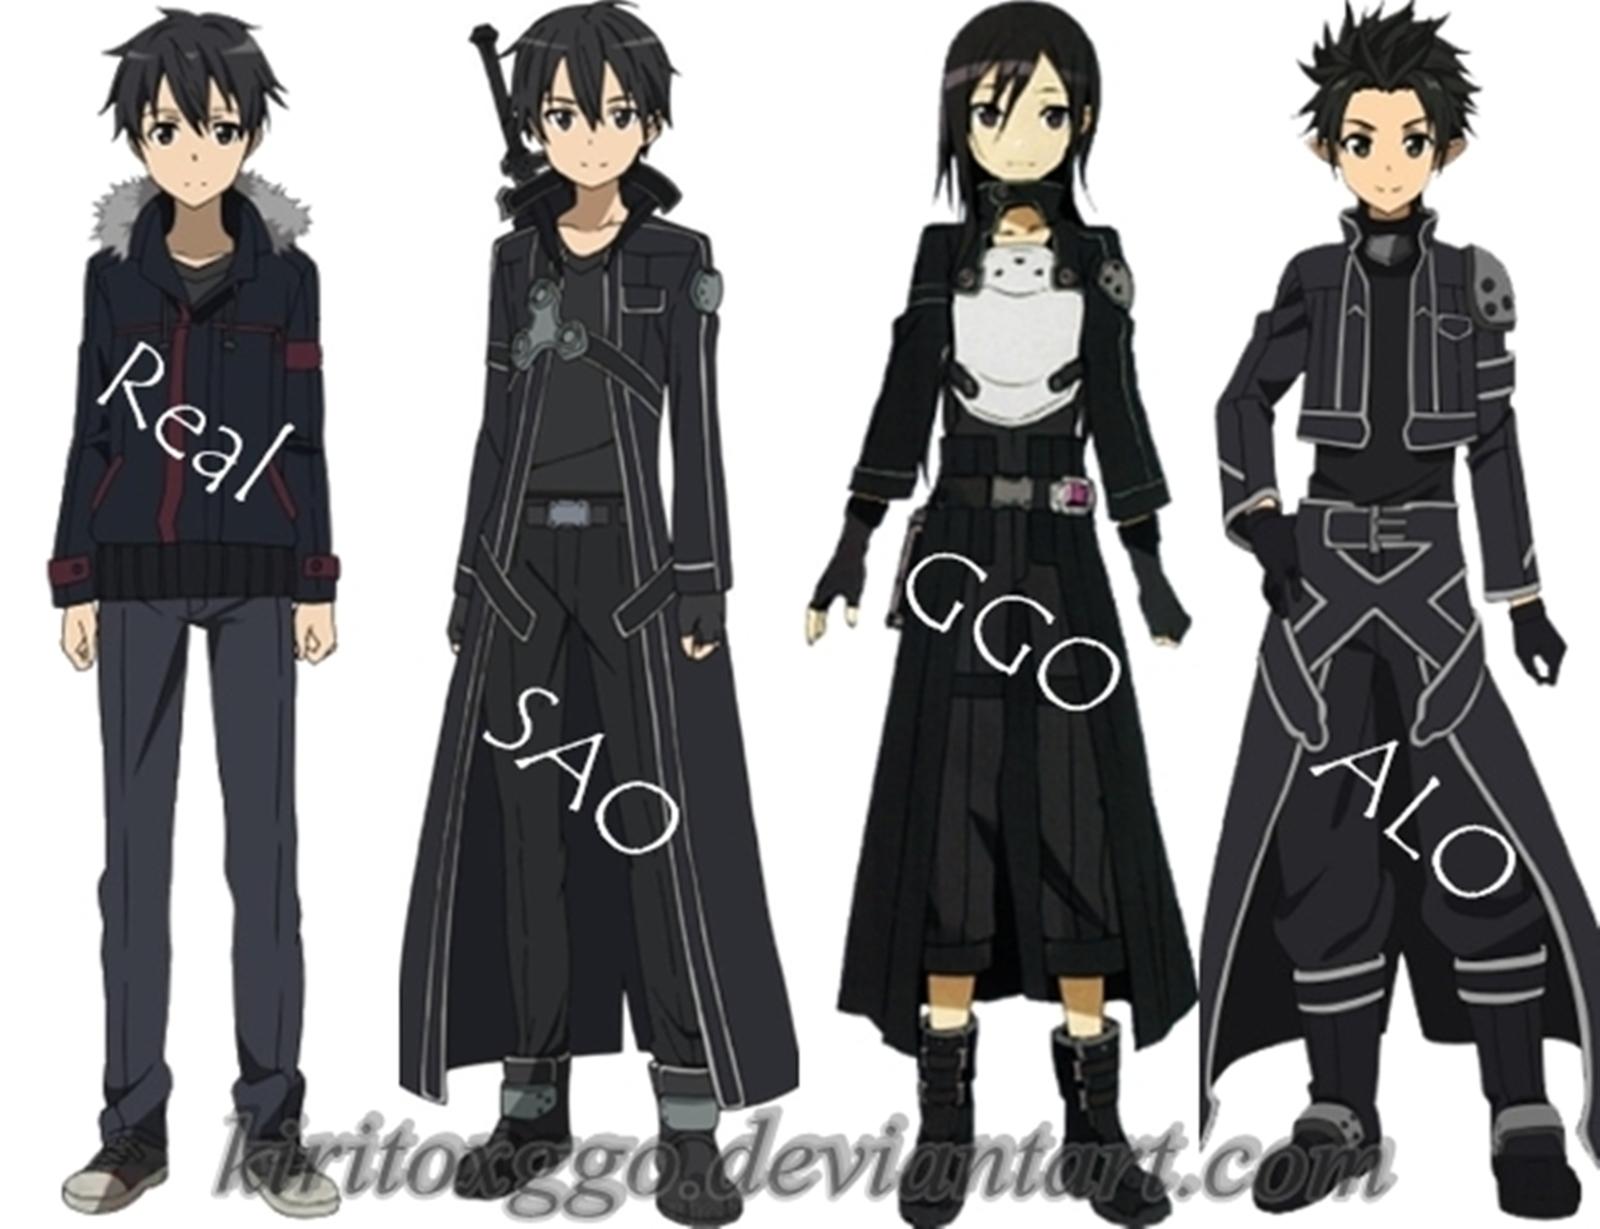 Kirigaya Kazuto Characters By Kiritoxggo